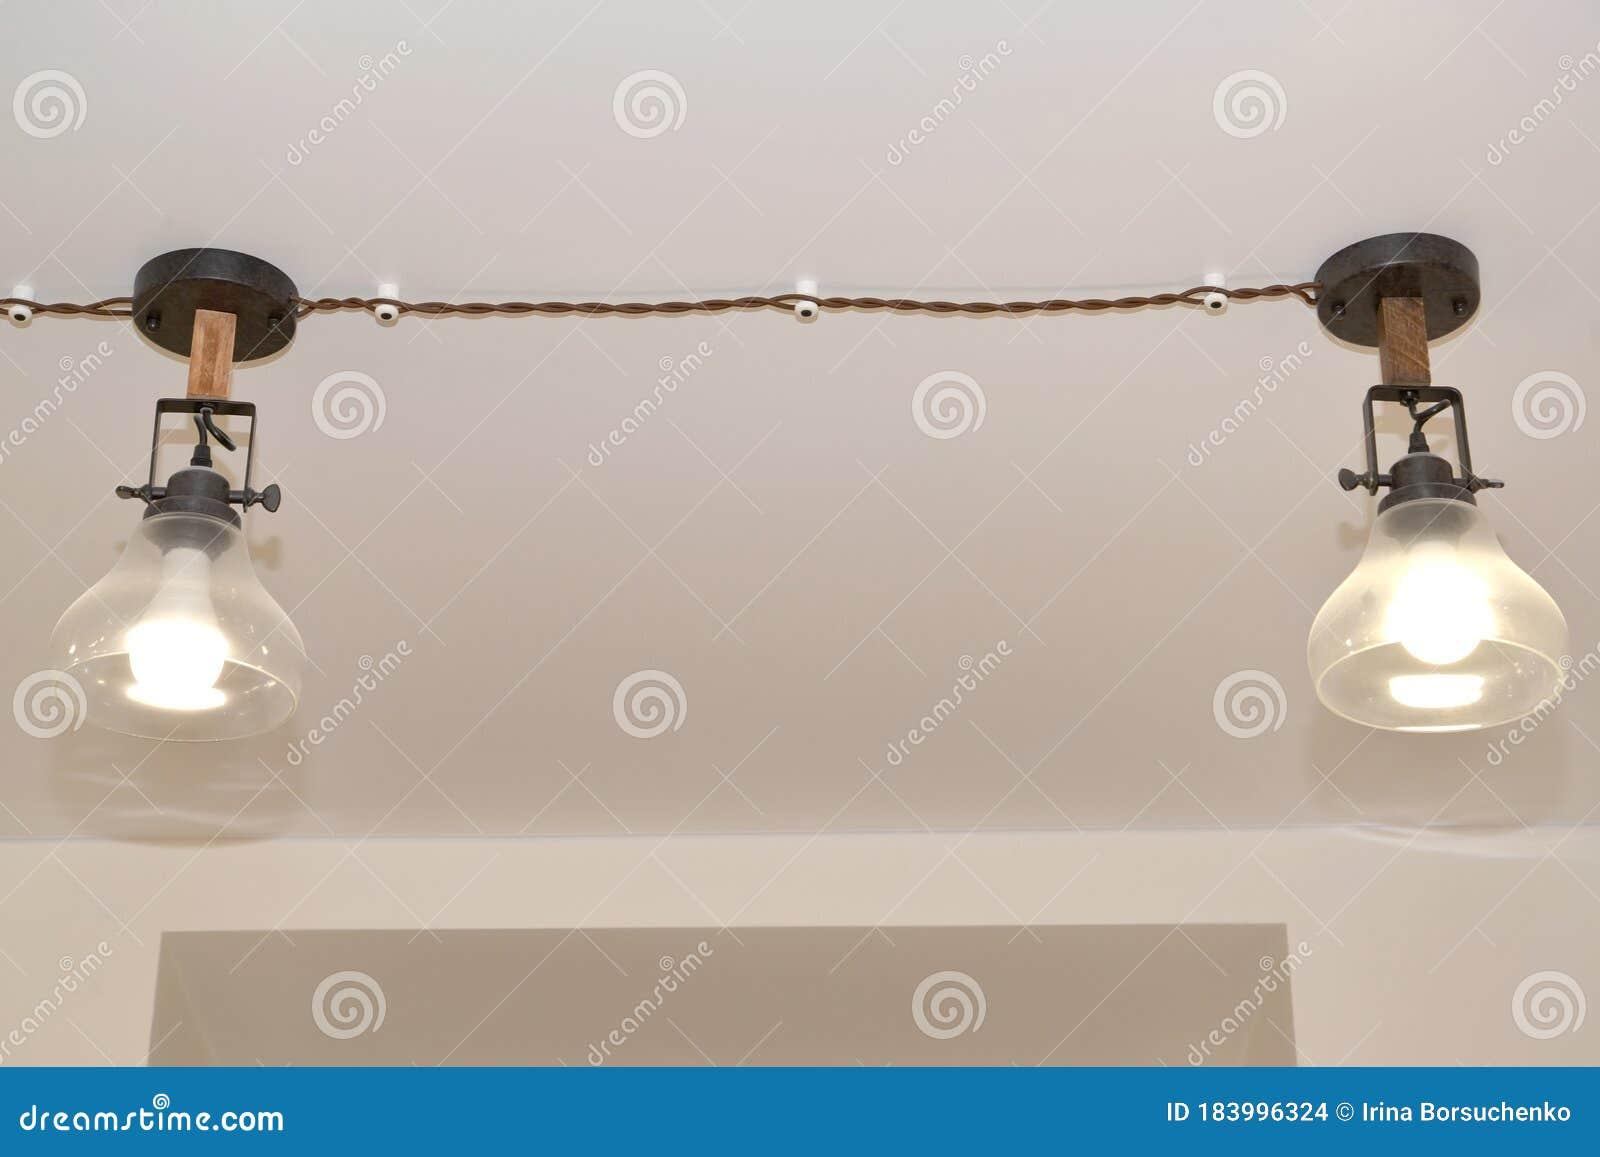 Two Suspended Retro